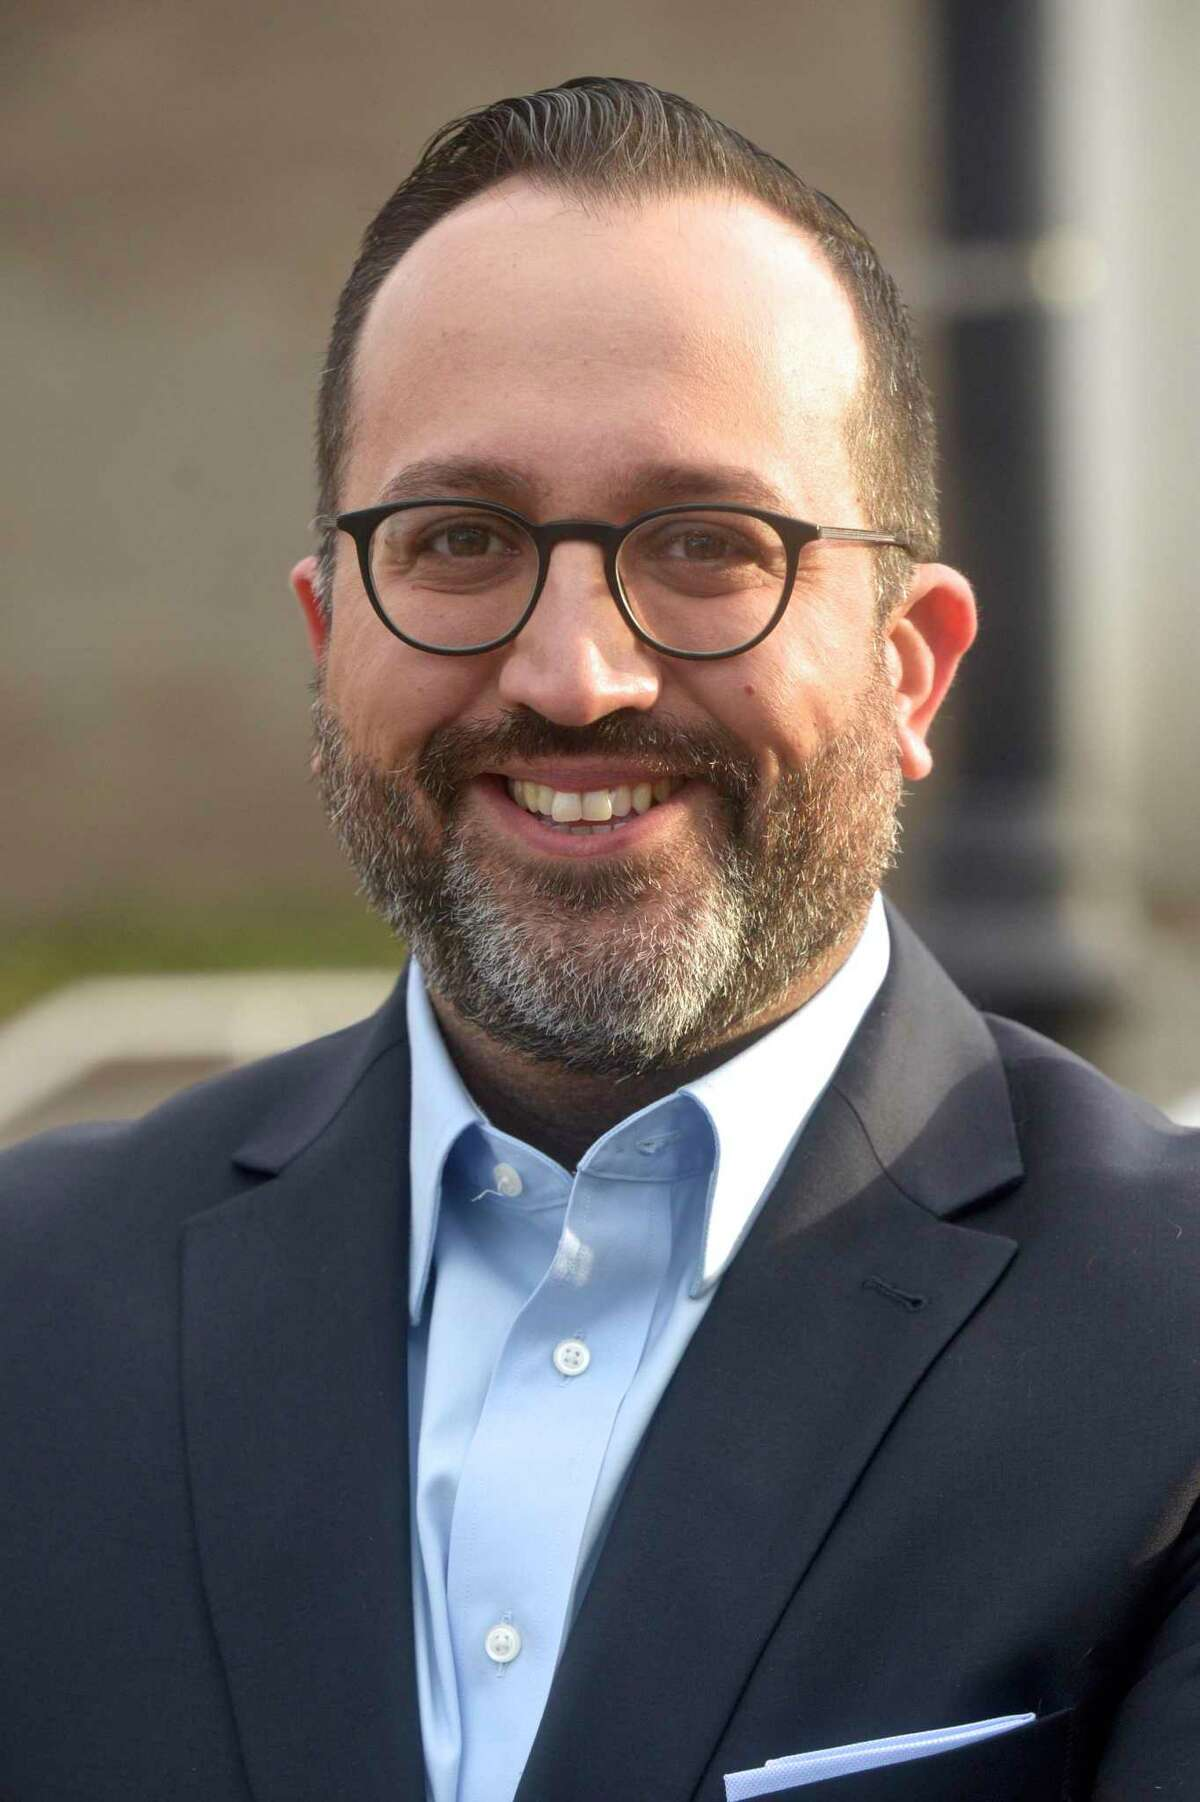 Democrat Roberto Alves, Danbury mayoral candidate.